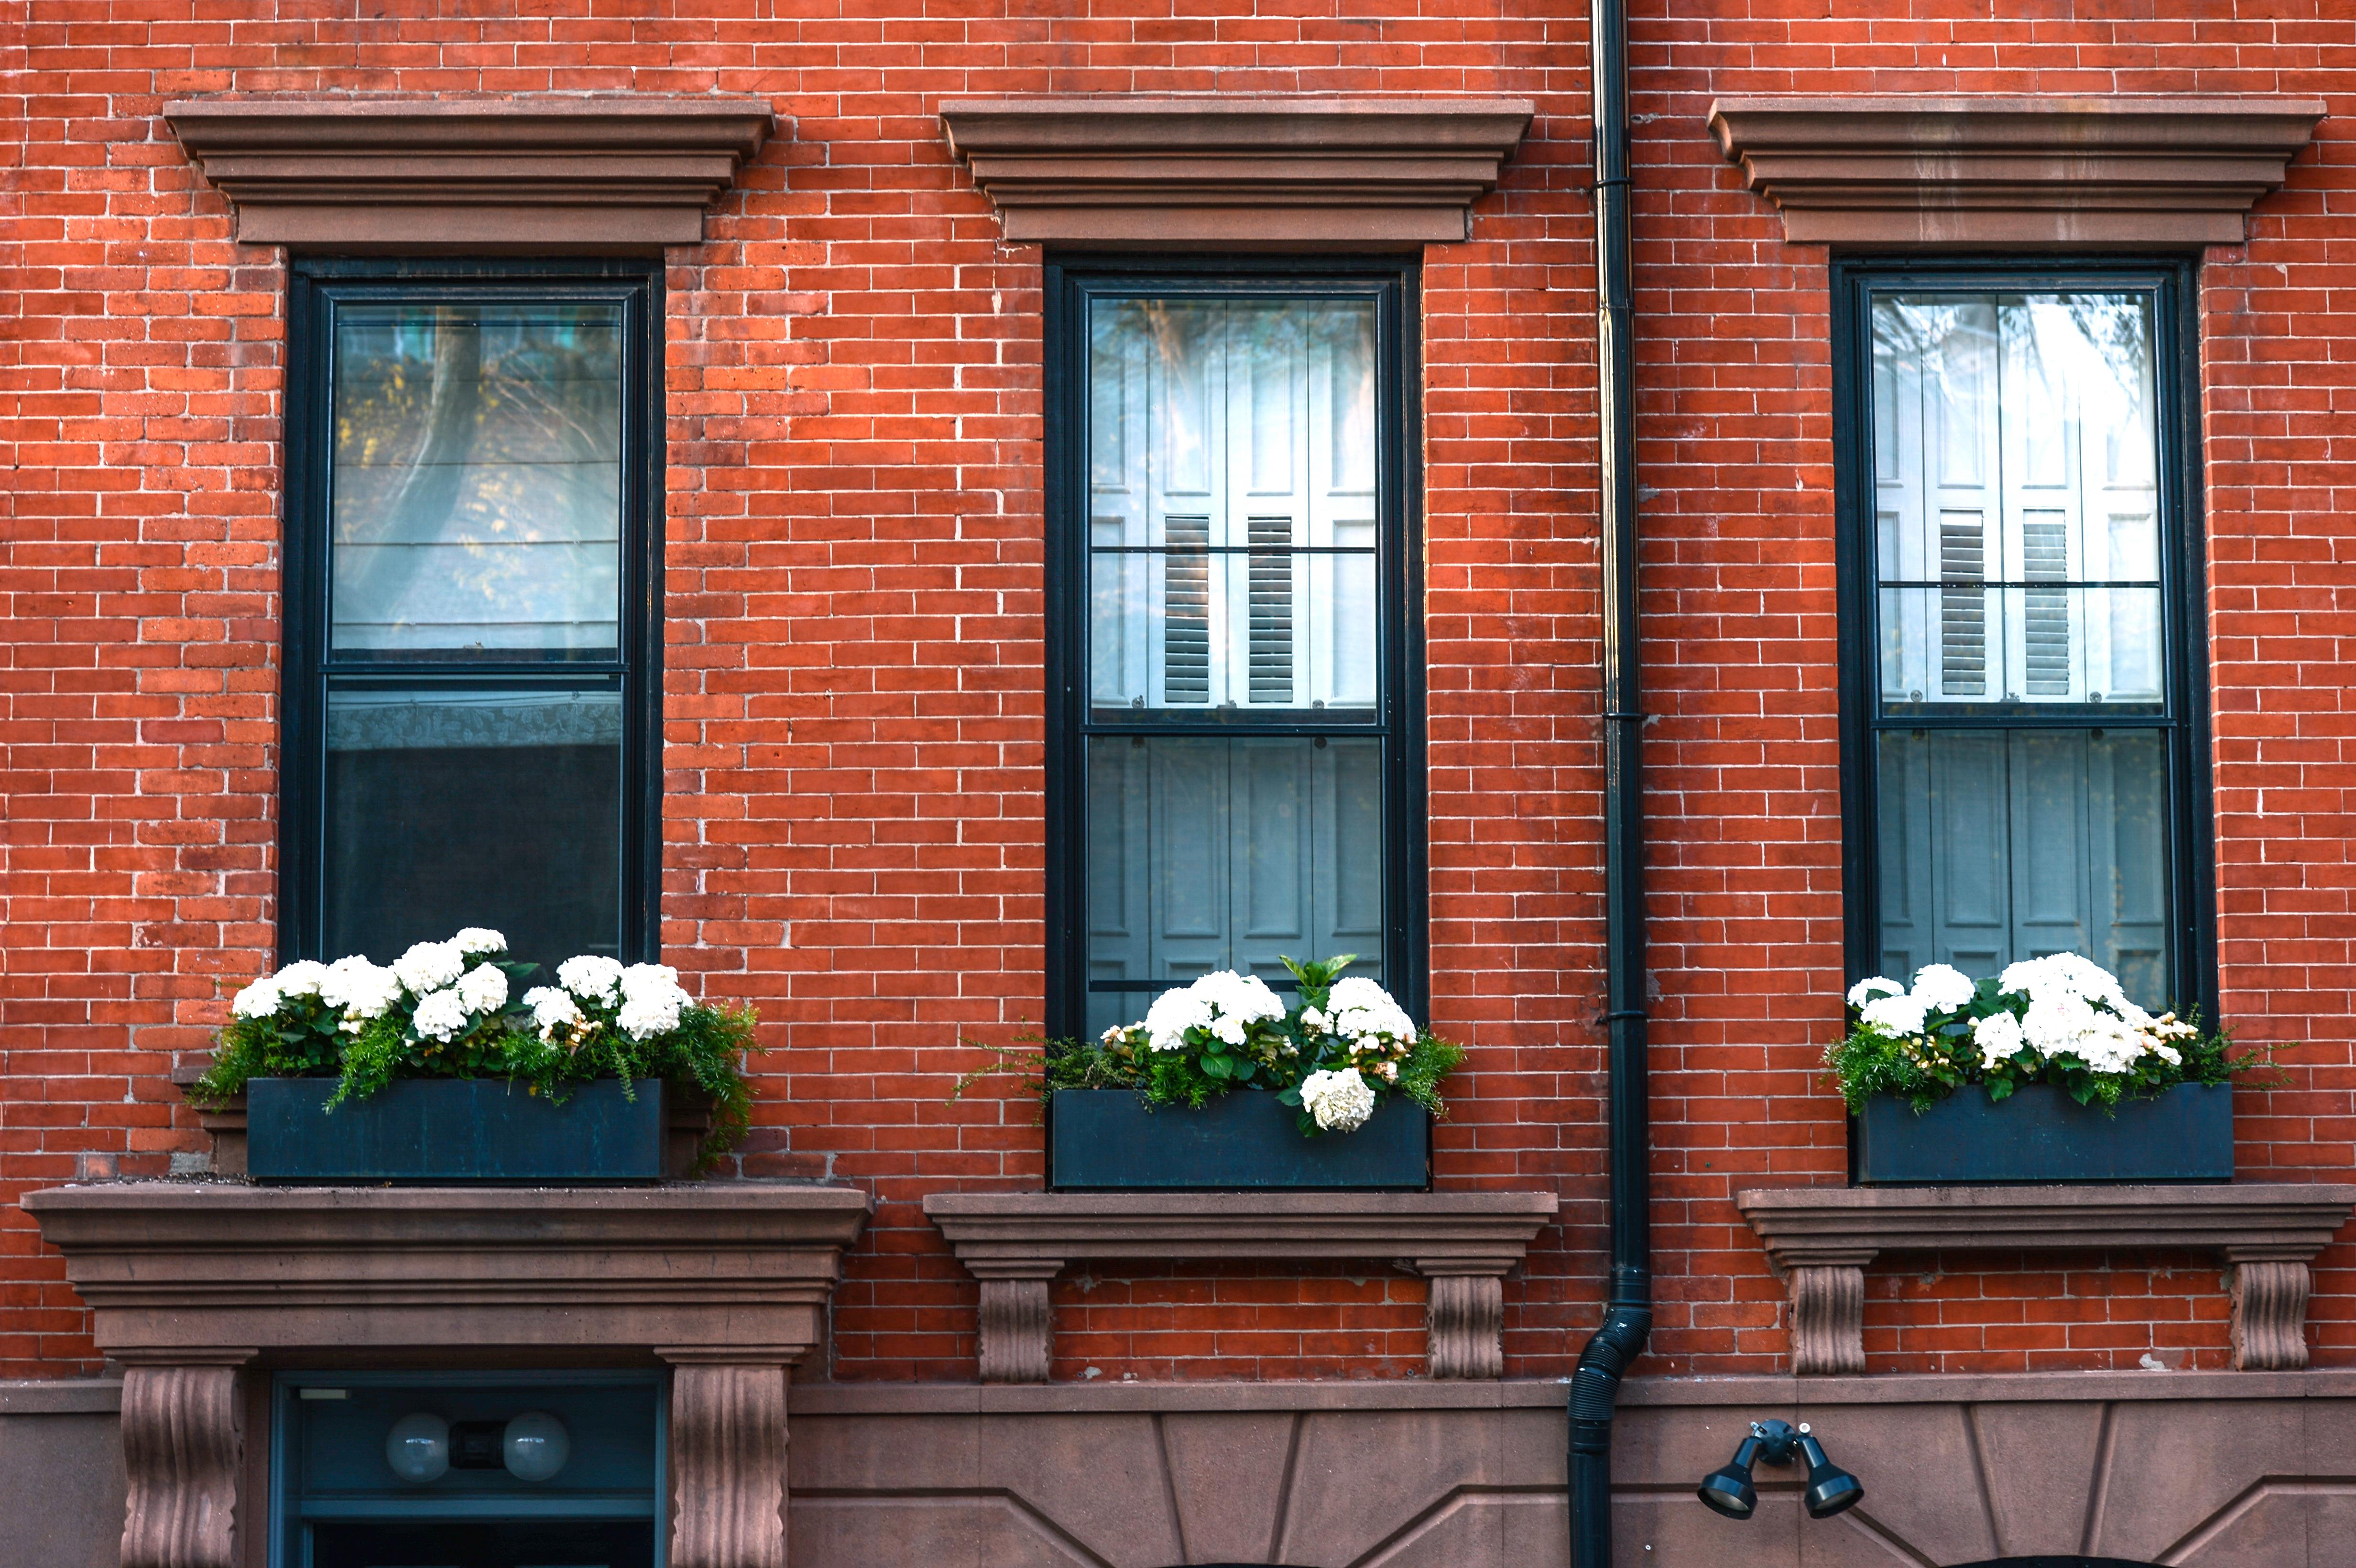 Class B, Suburban Class A Apartment Properties Gain Momentum | National  Real Estate Investor